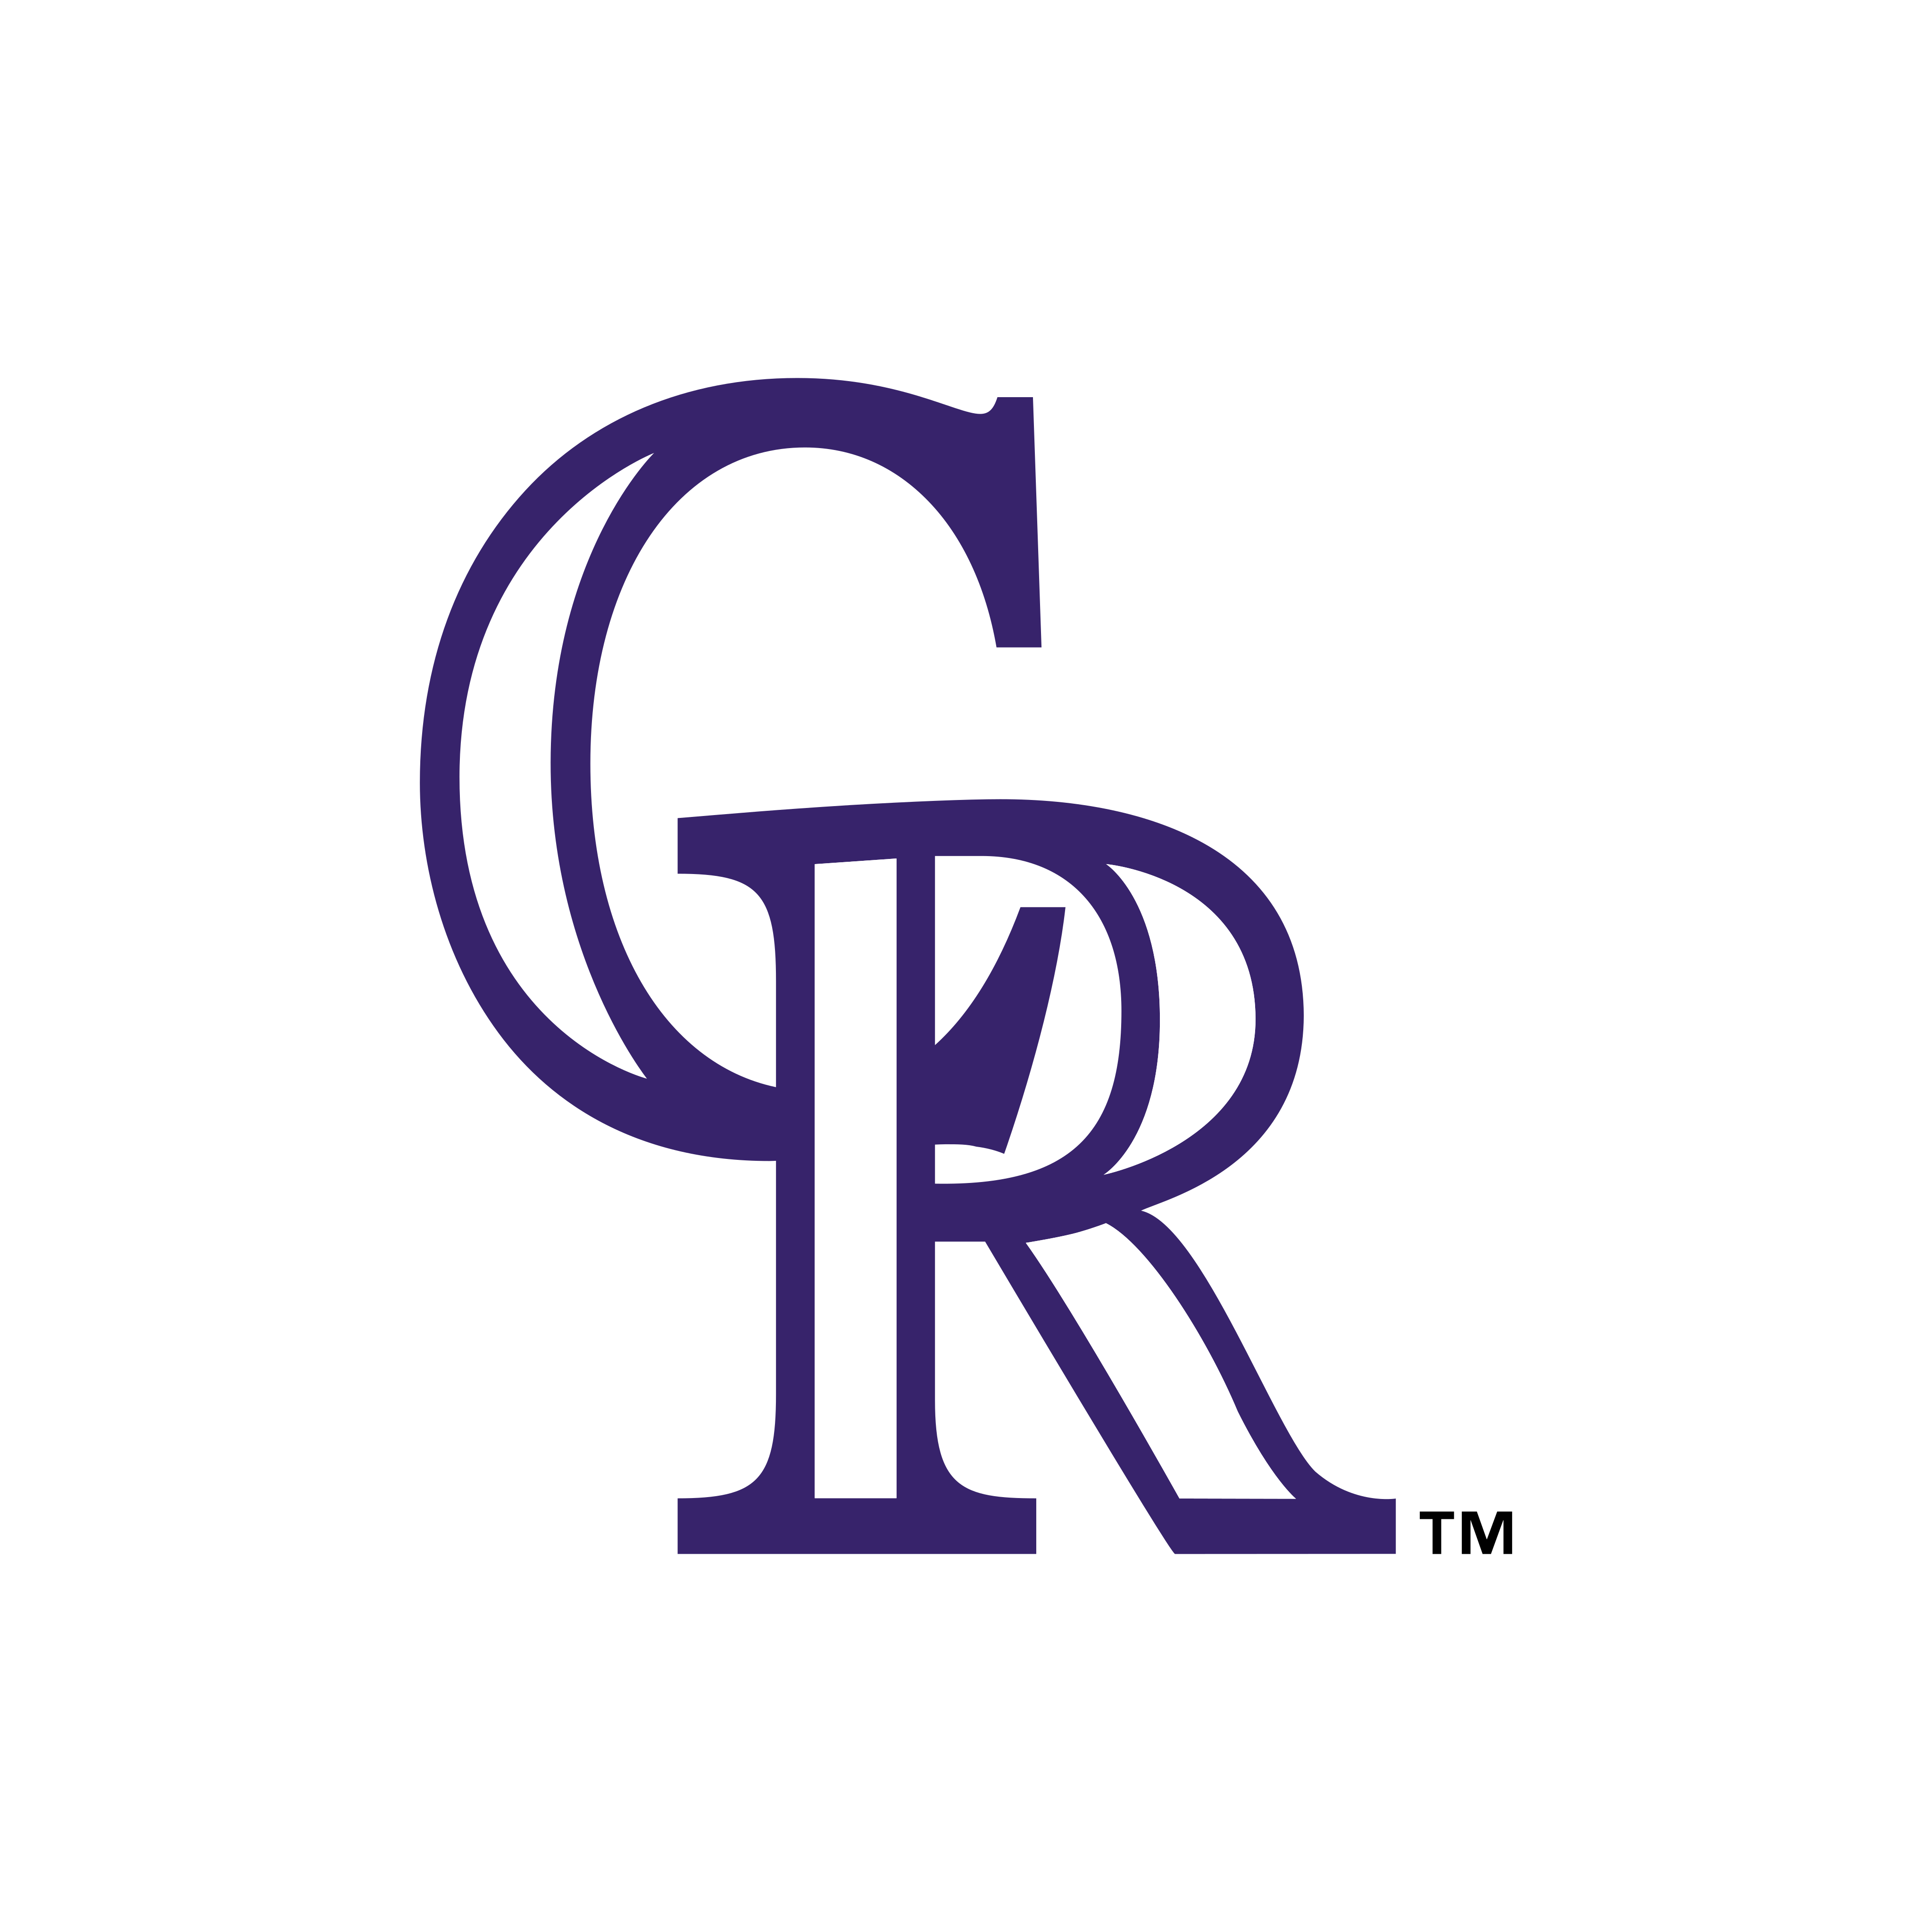 colorado rockies logo 0 - Colorado Rockies Logo